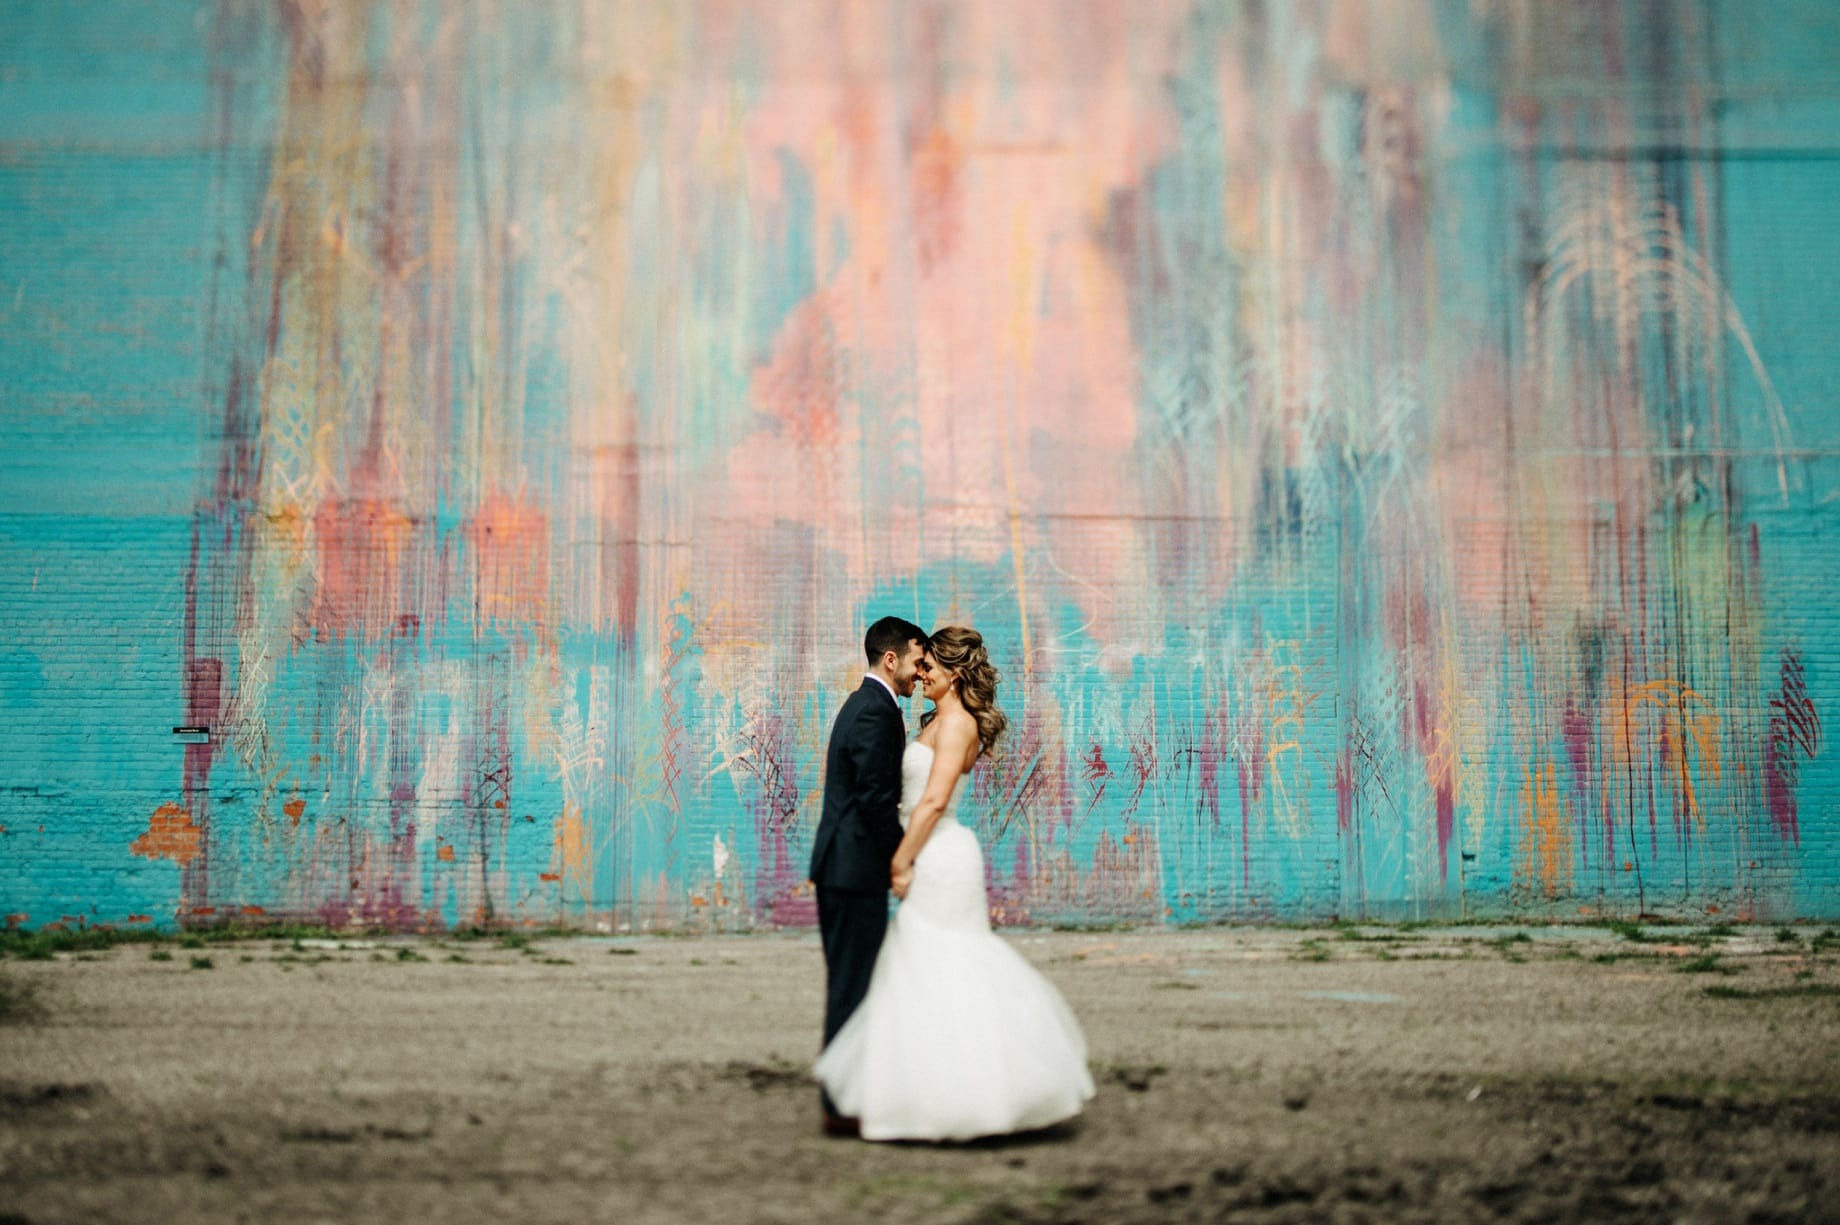 detroit wedding photography near the illuminated mural